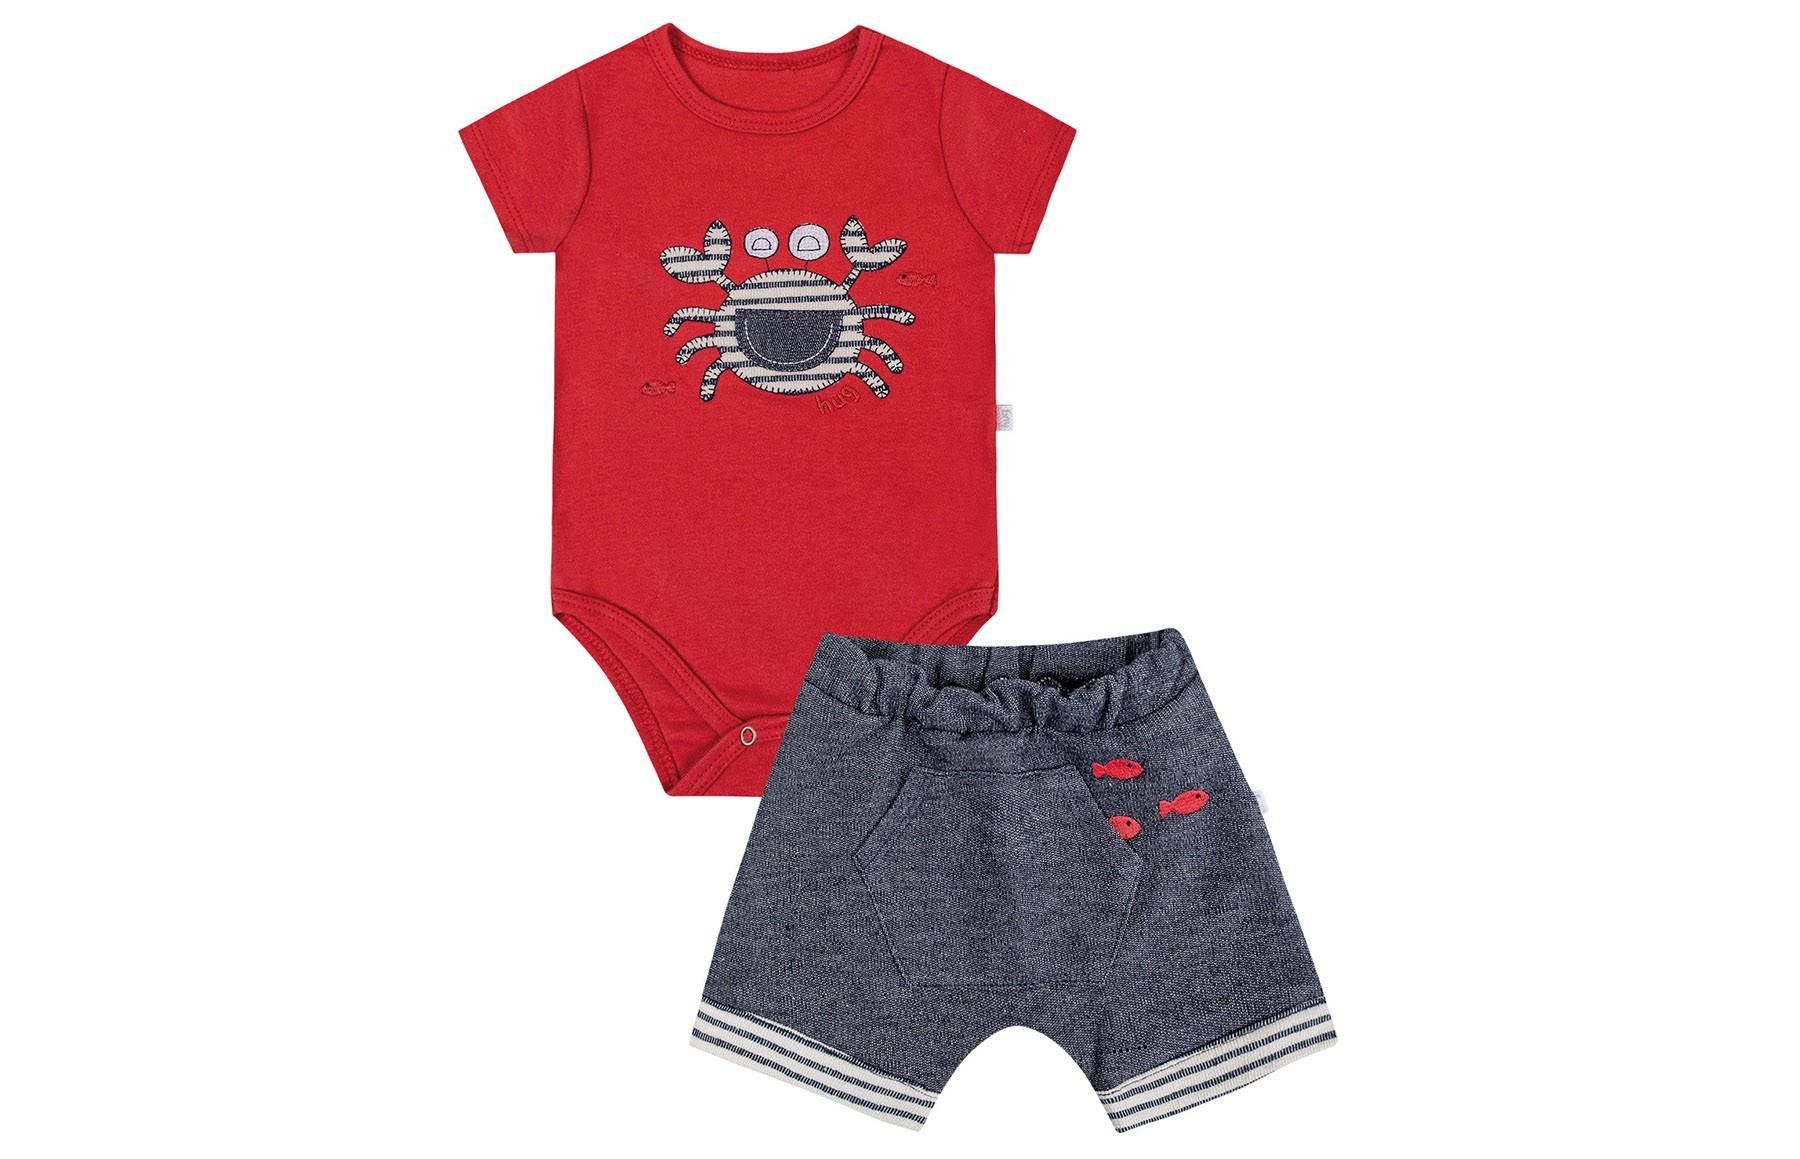 Conjunto Body mg Curta + Shorts - Vermelho